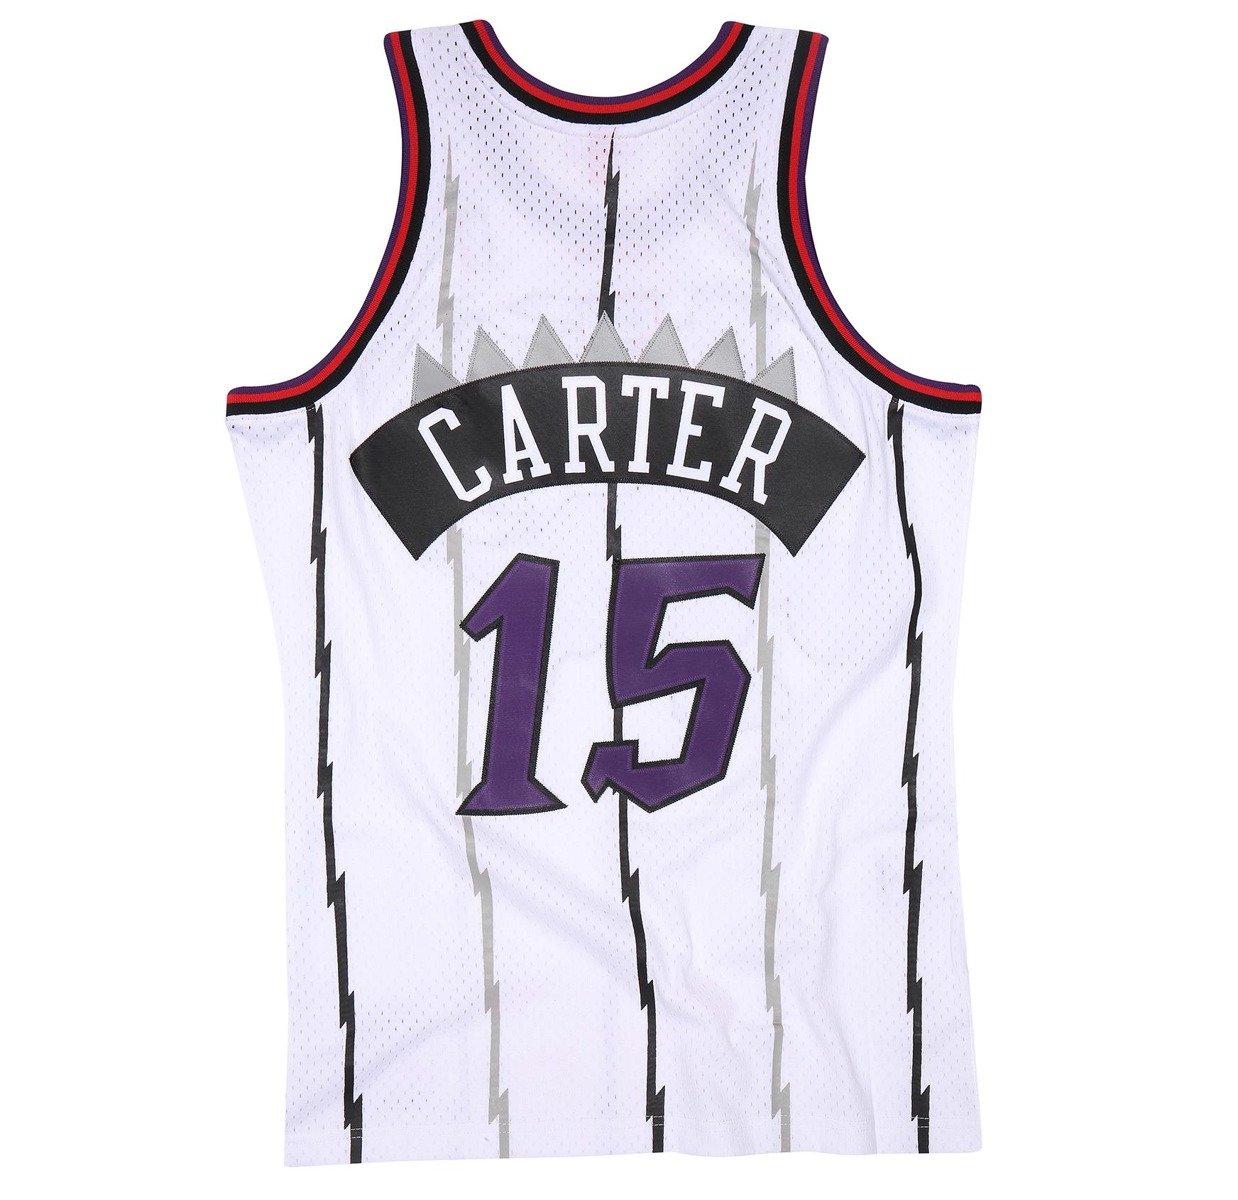 newest collection d8817 af2f8 Mitchell & Ness NBA Toronto Raptors Vince Carter Swingman Jersey